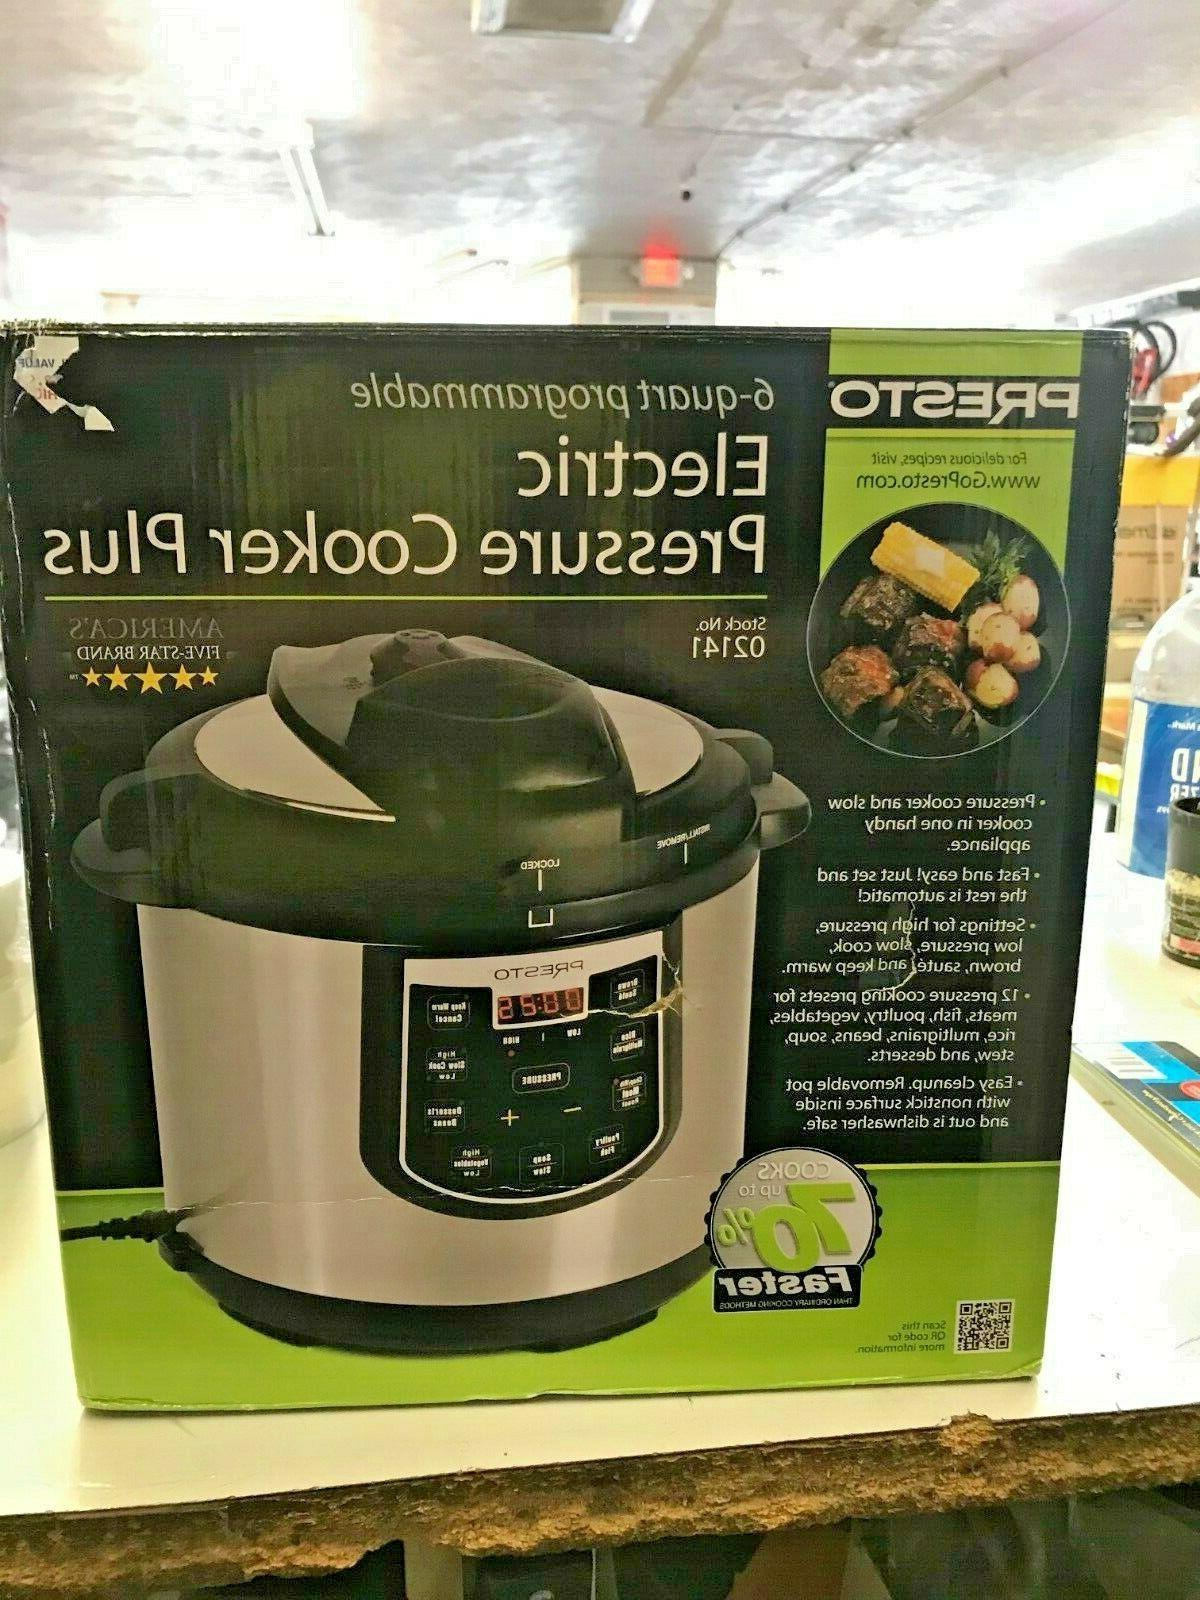 02141 electric pressure cooker